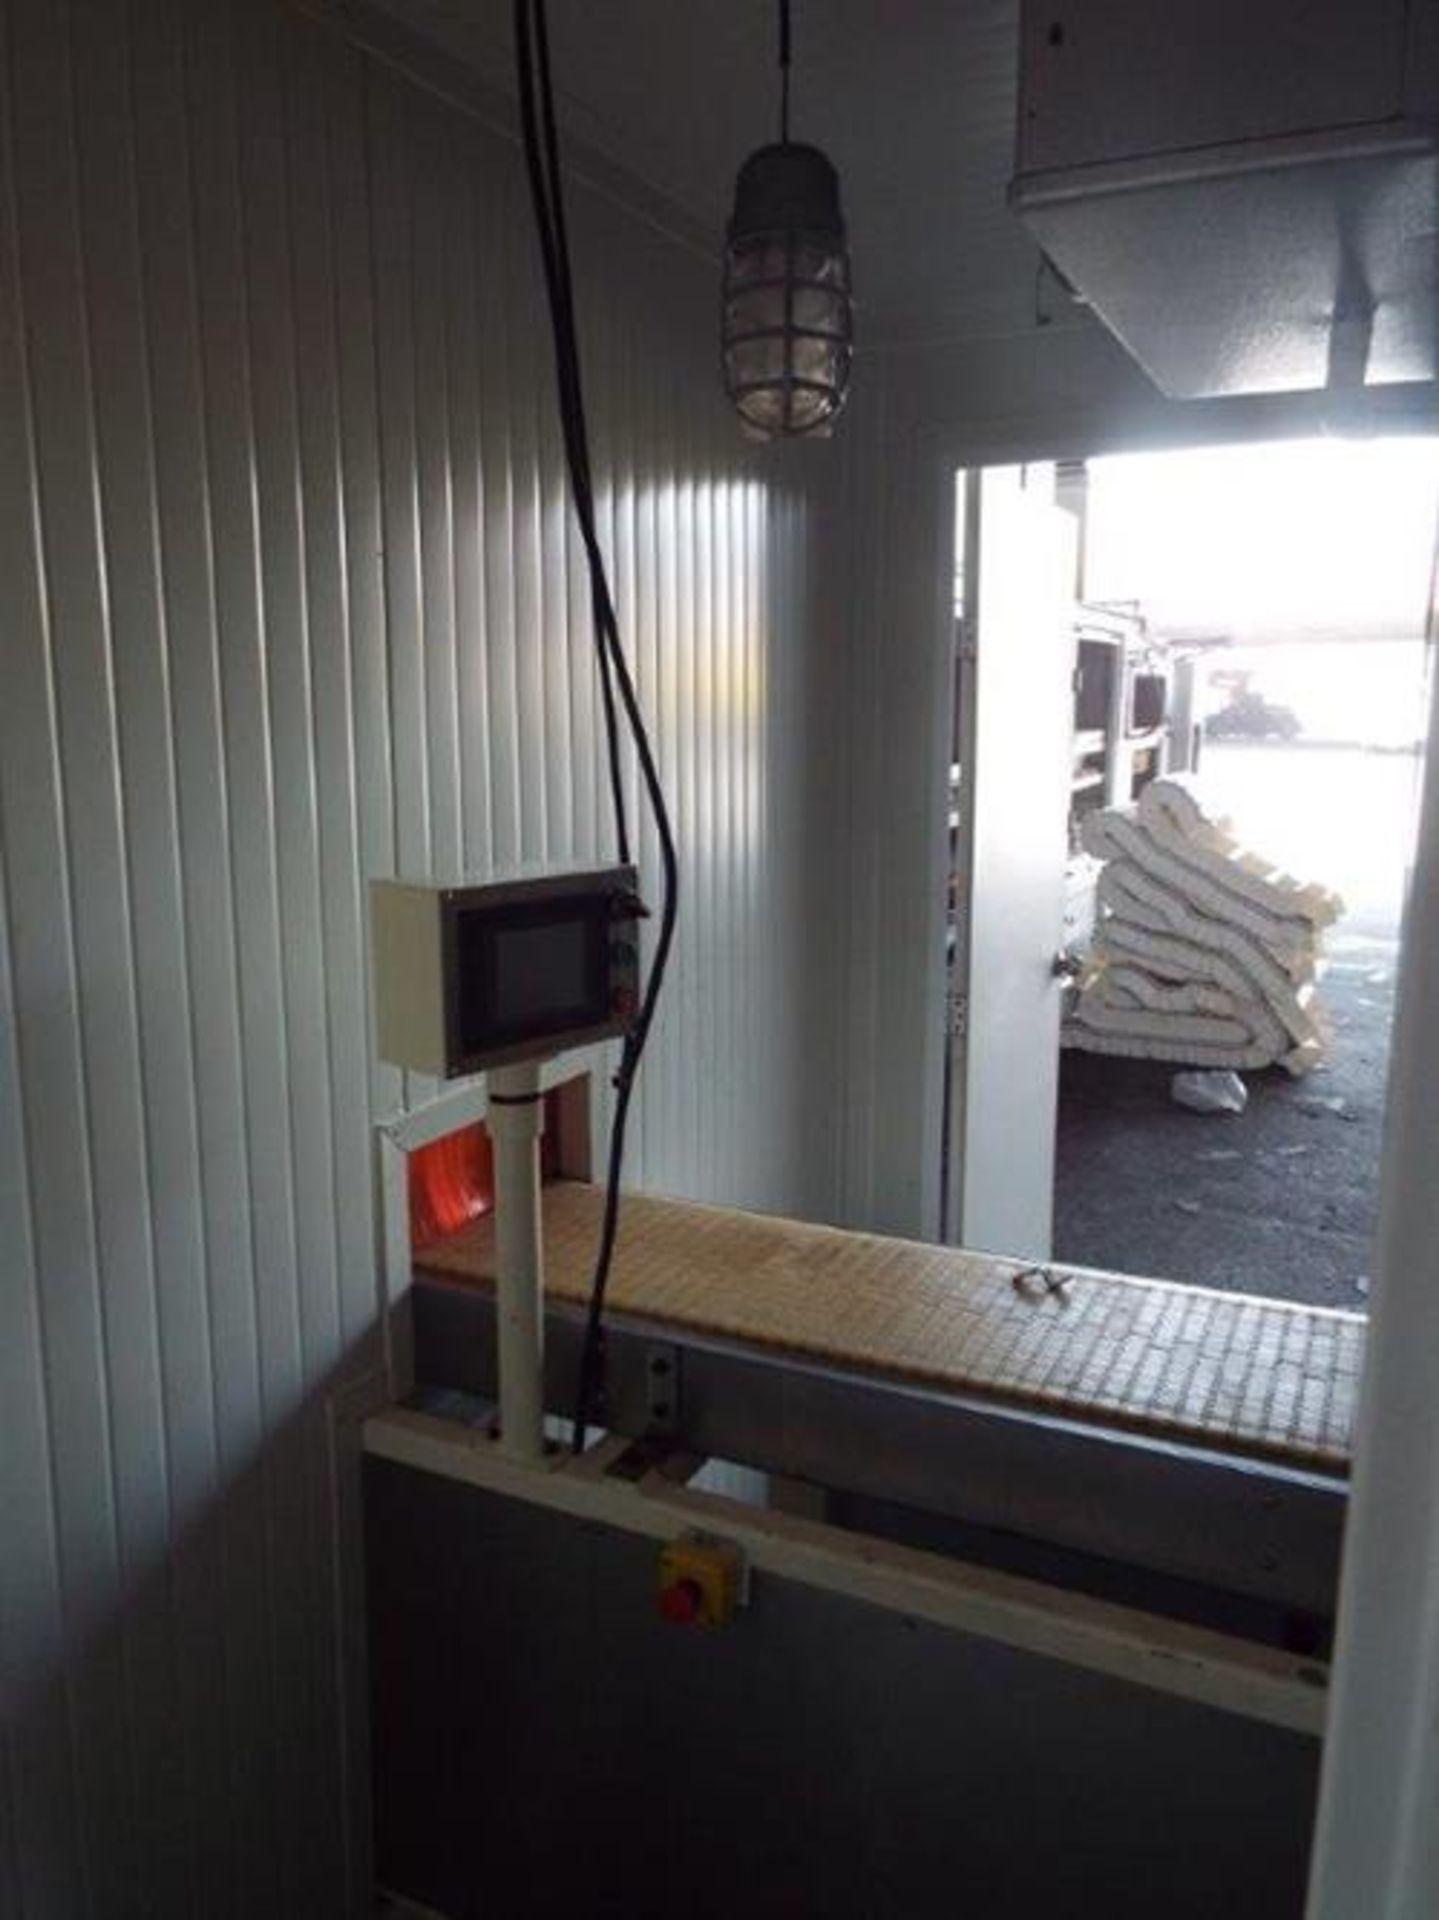 Tecmaq 290 mm Wide Slab Forming Line - Model TM-6H built 2012 - Three sets of gauging/sheeting - Image 8 of 30